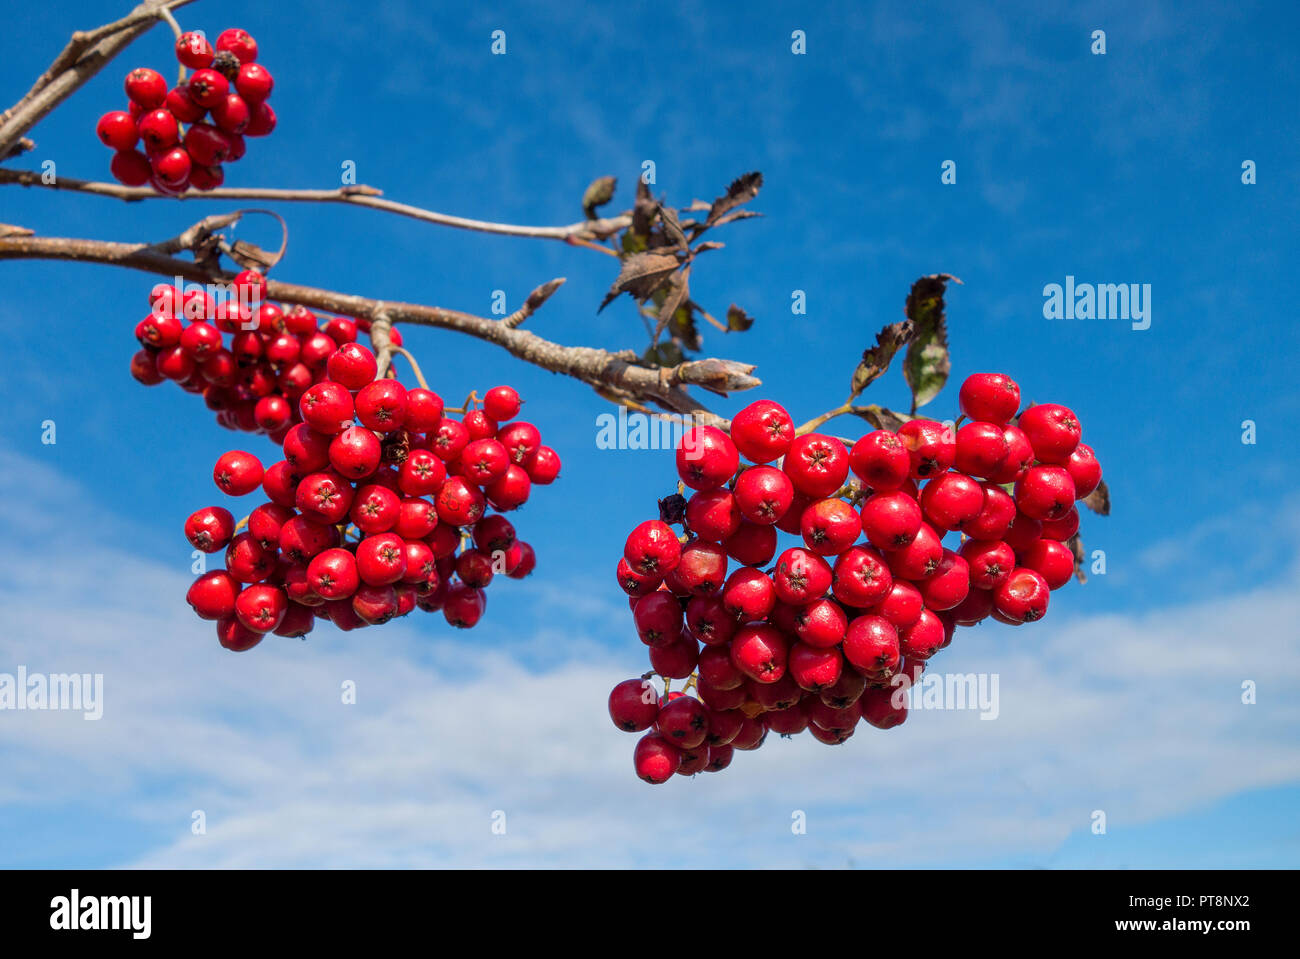 rowan berries on mountain ash, rowan tree, against blue sky. - Stock Image